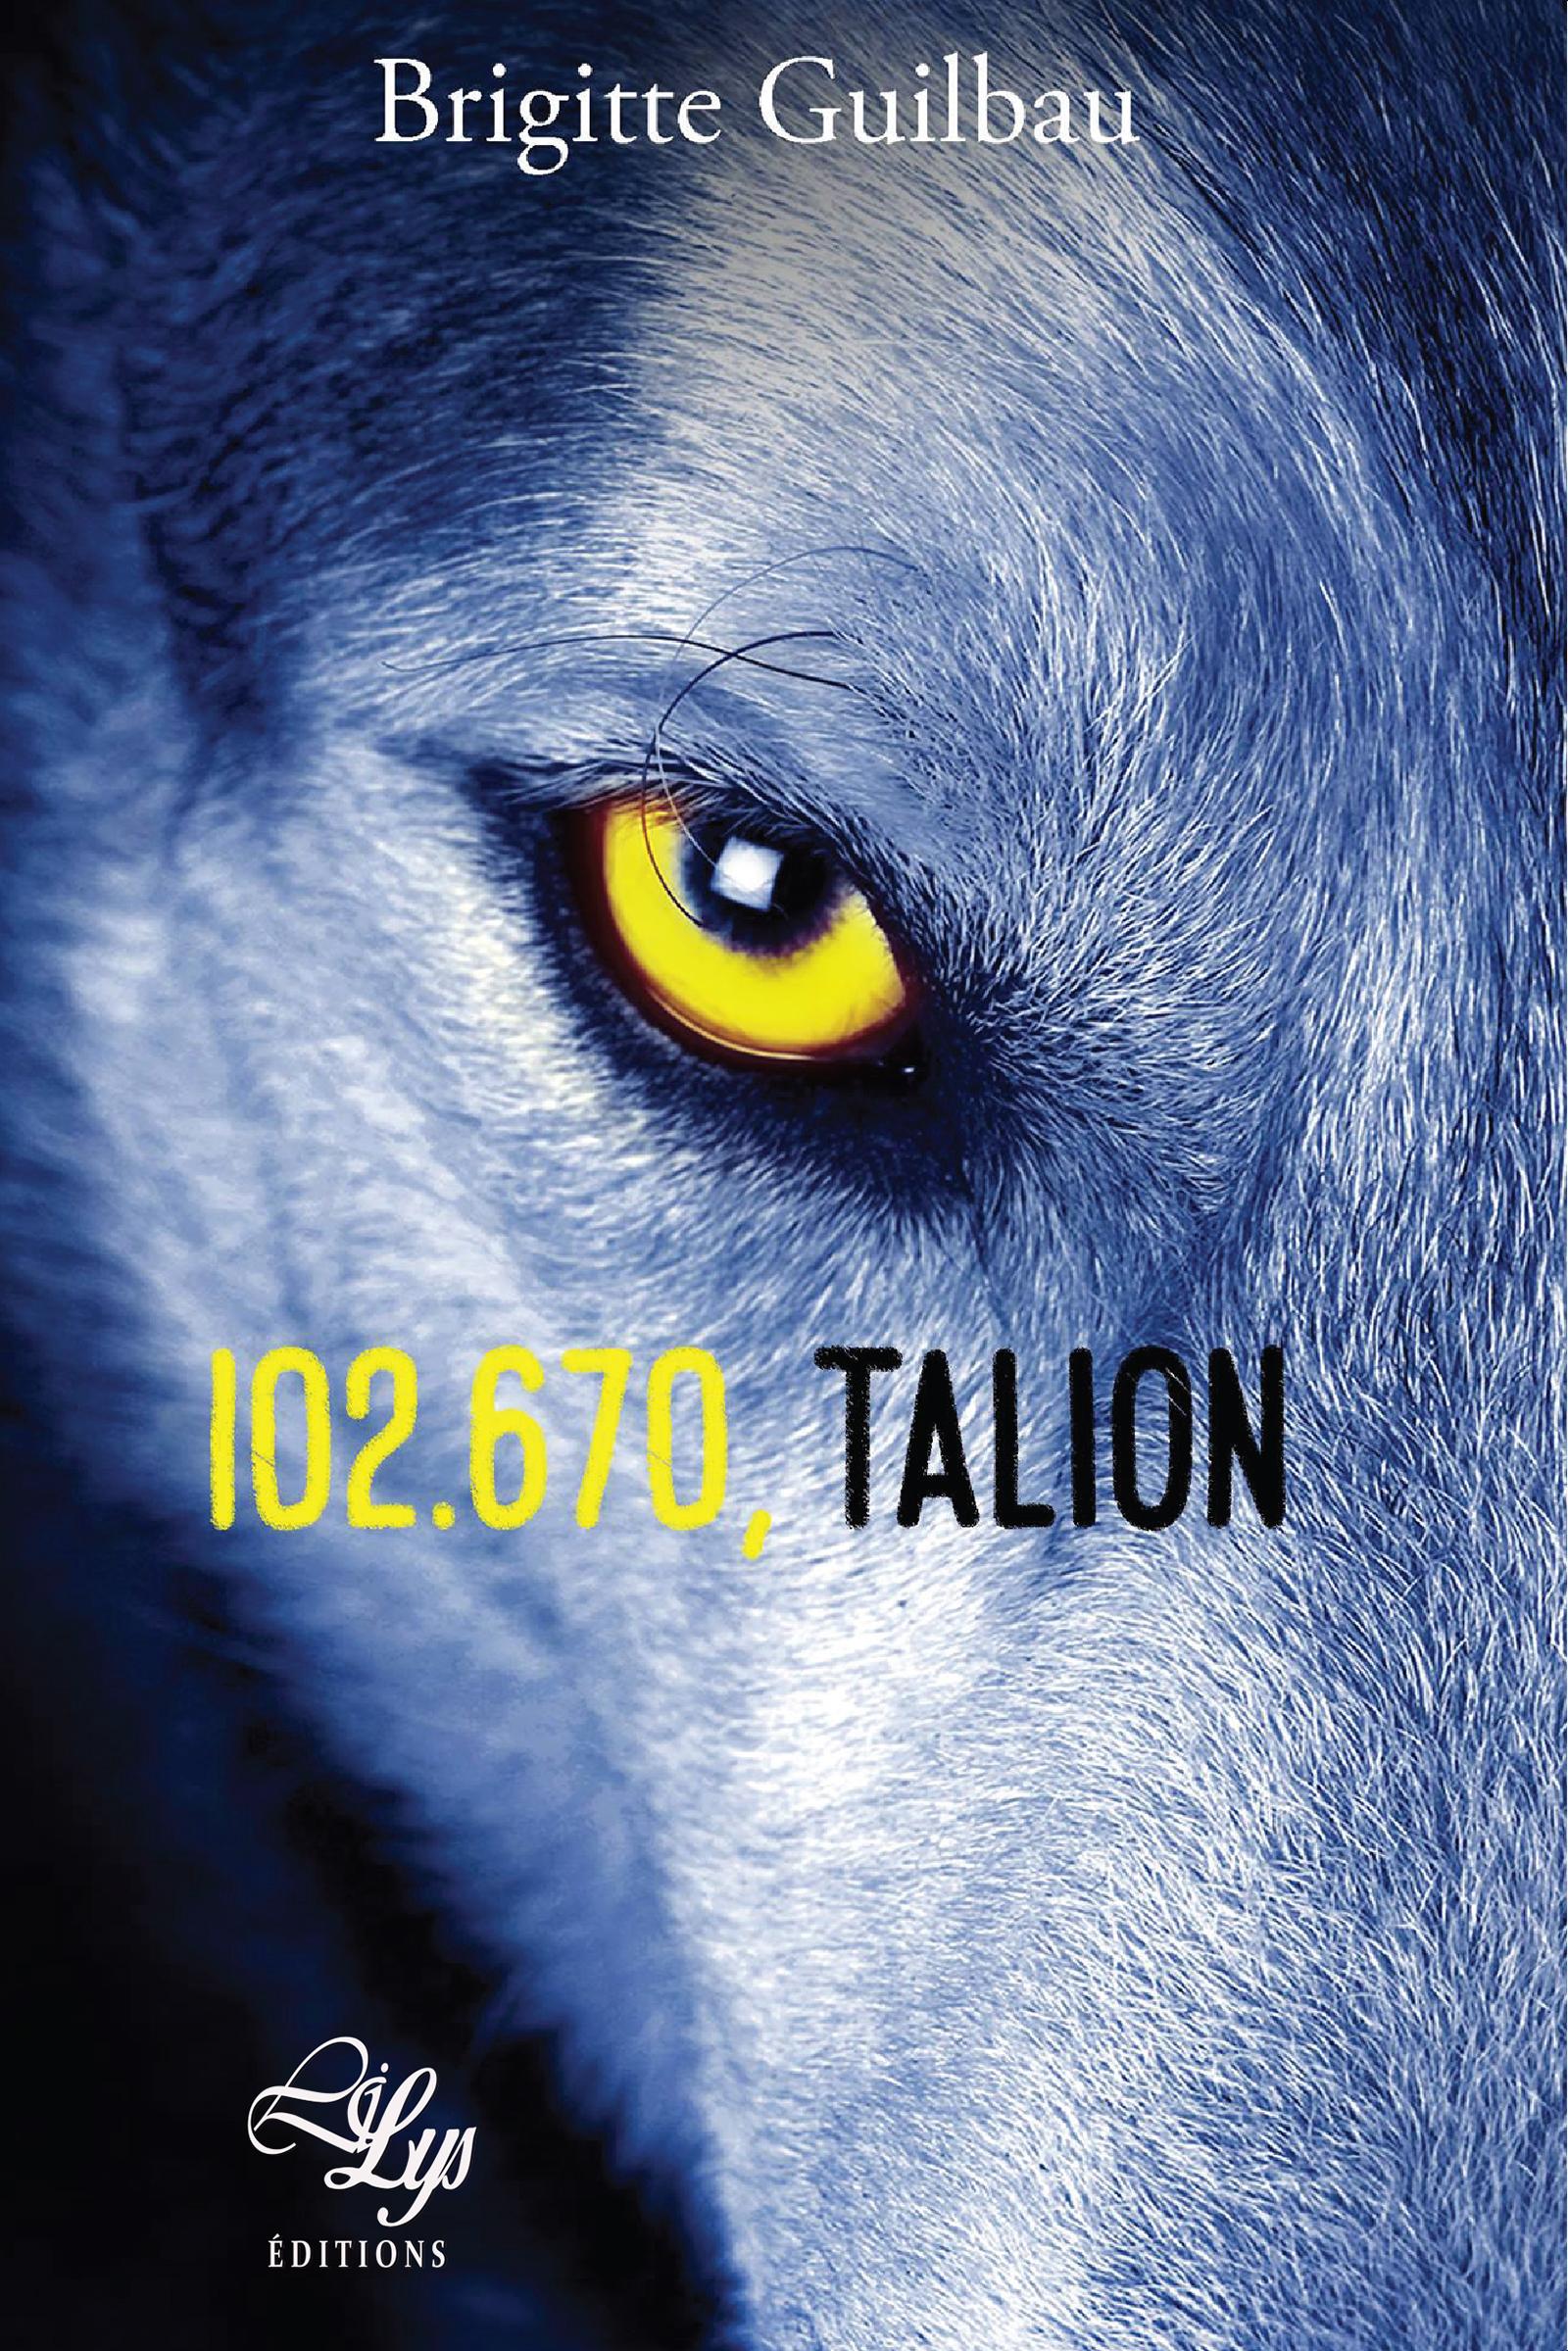 102.670, Talion